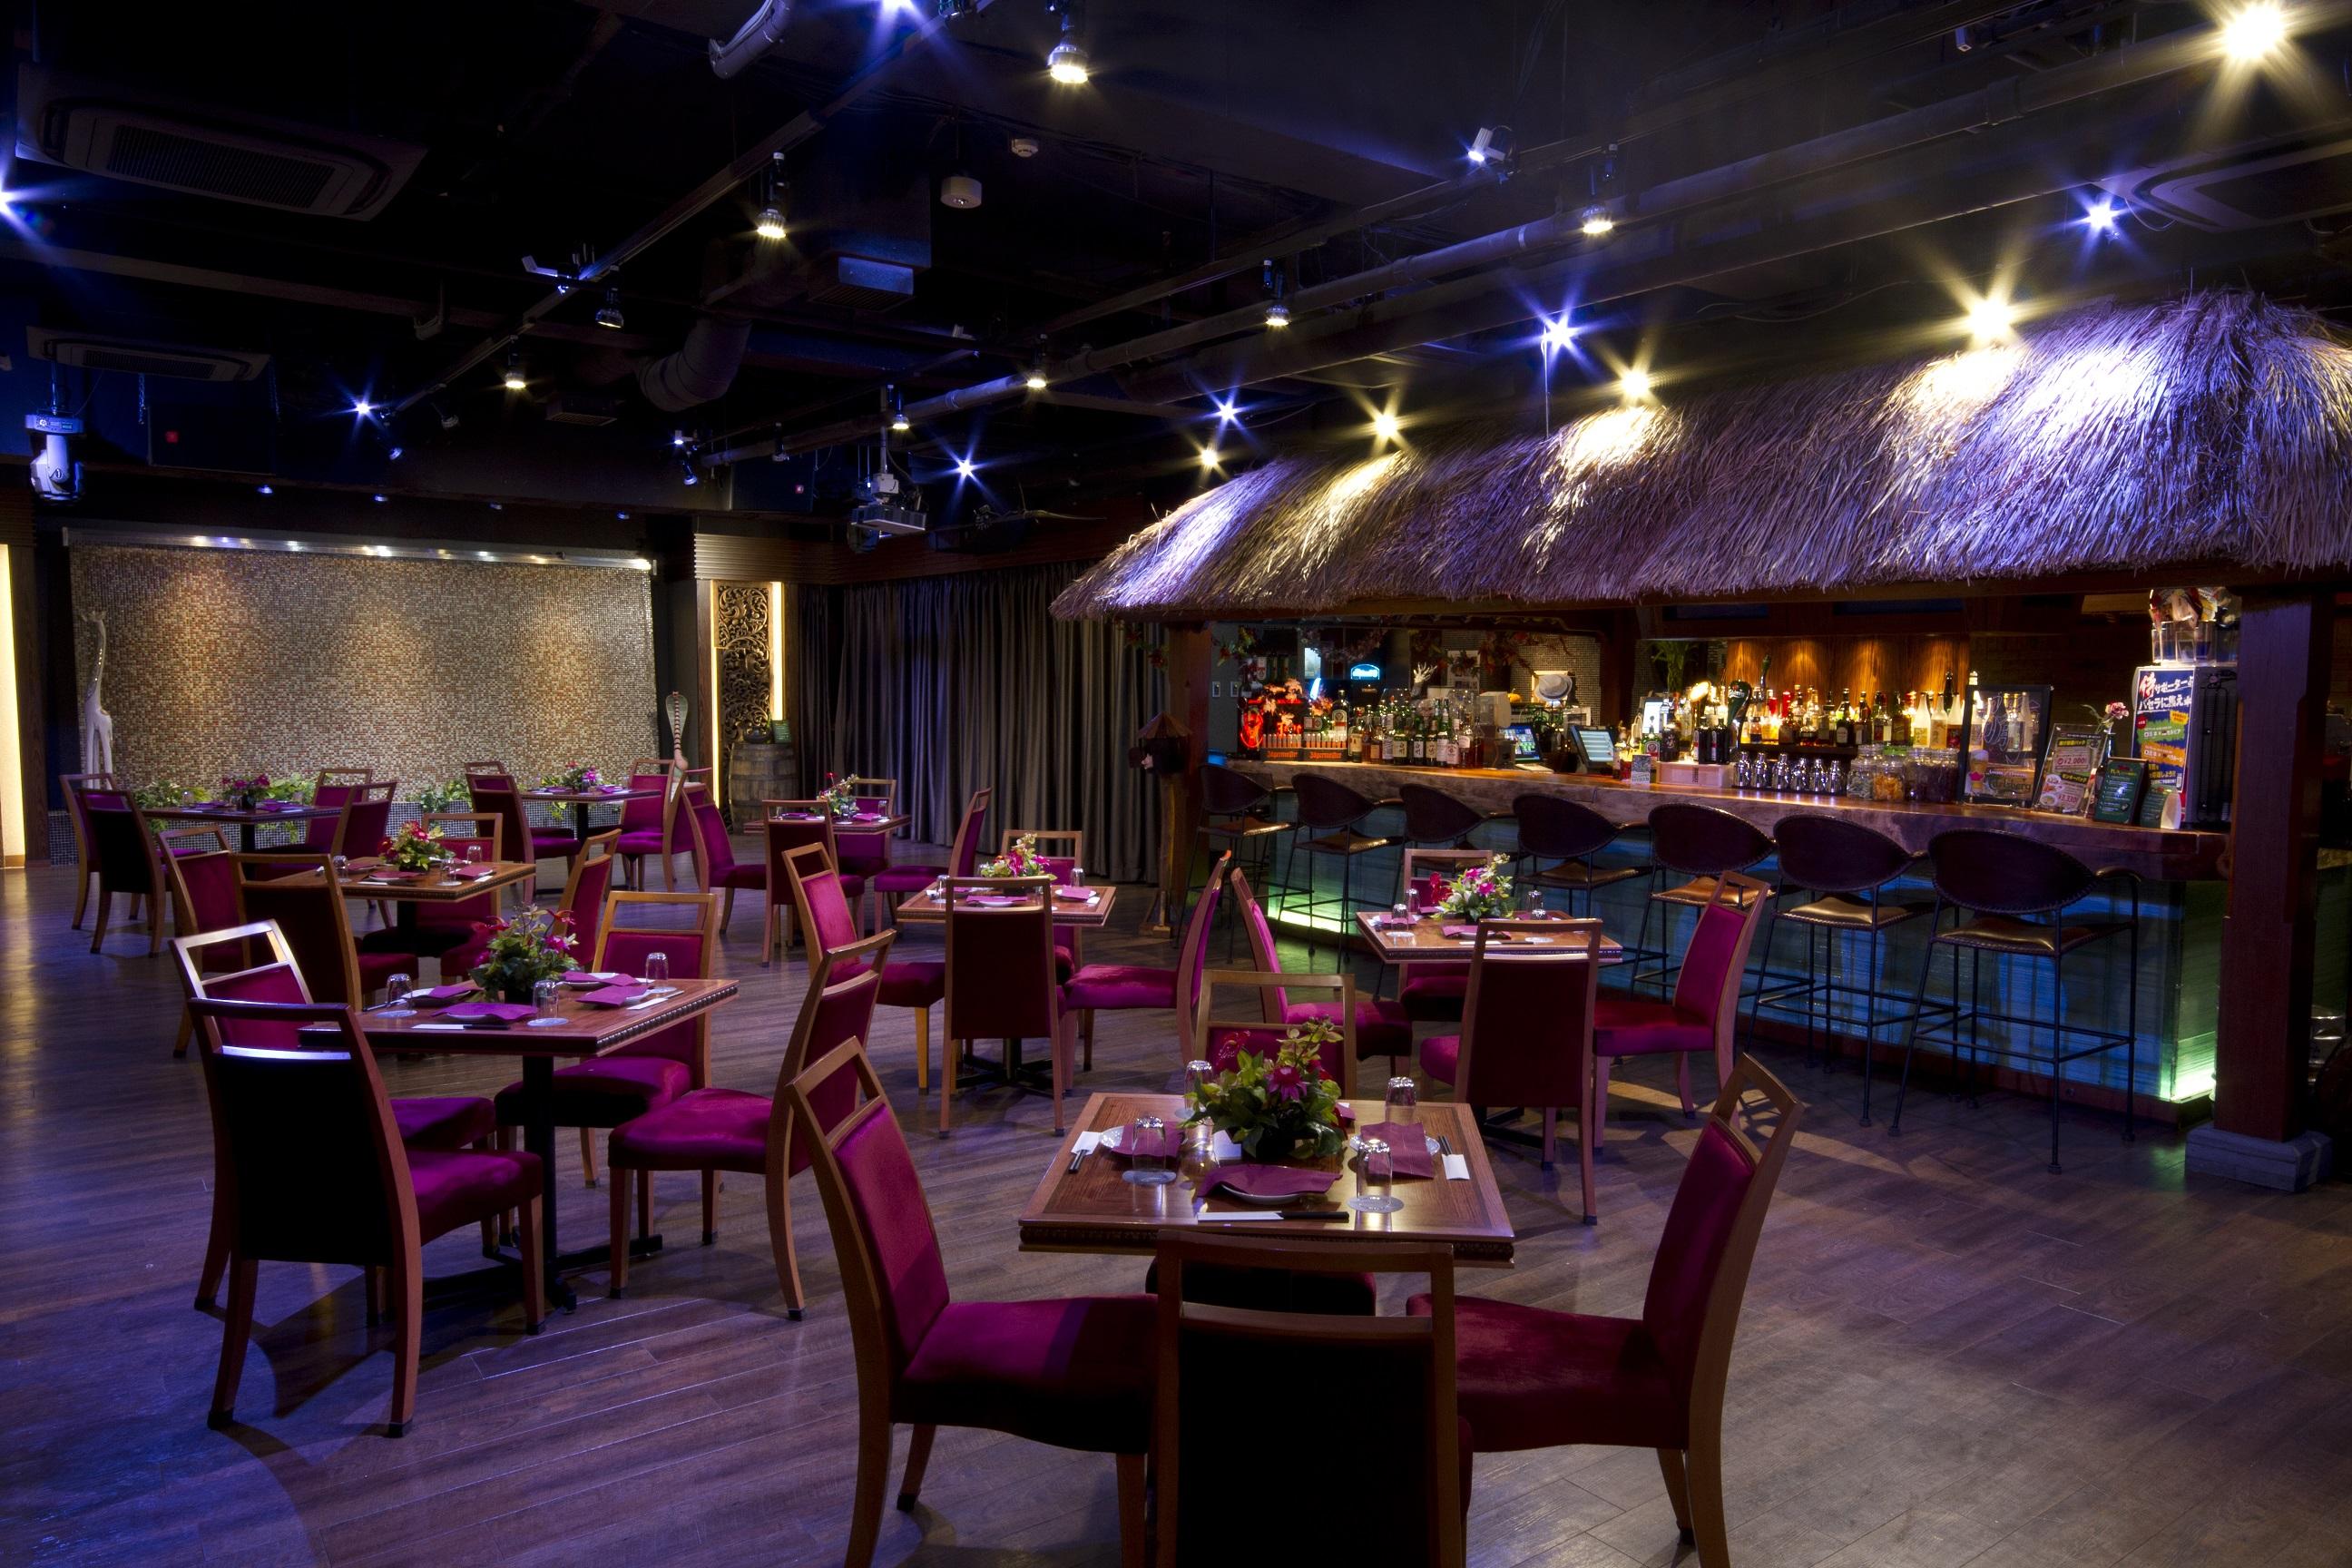 3F Three Monkeys Cafe 南国リゾートのような空間は秋葉原最大級!立食300名様までOK